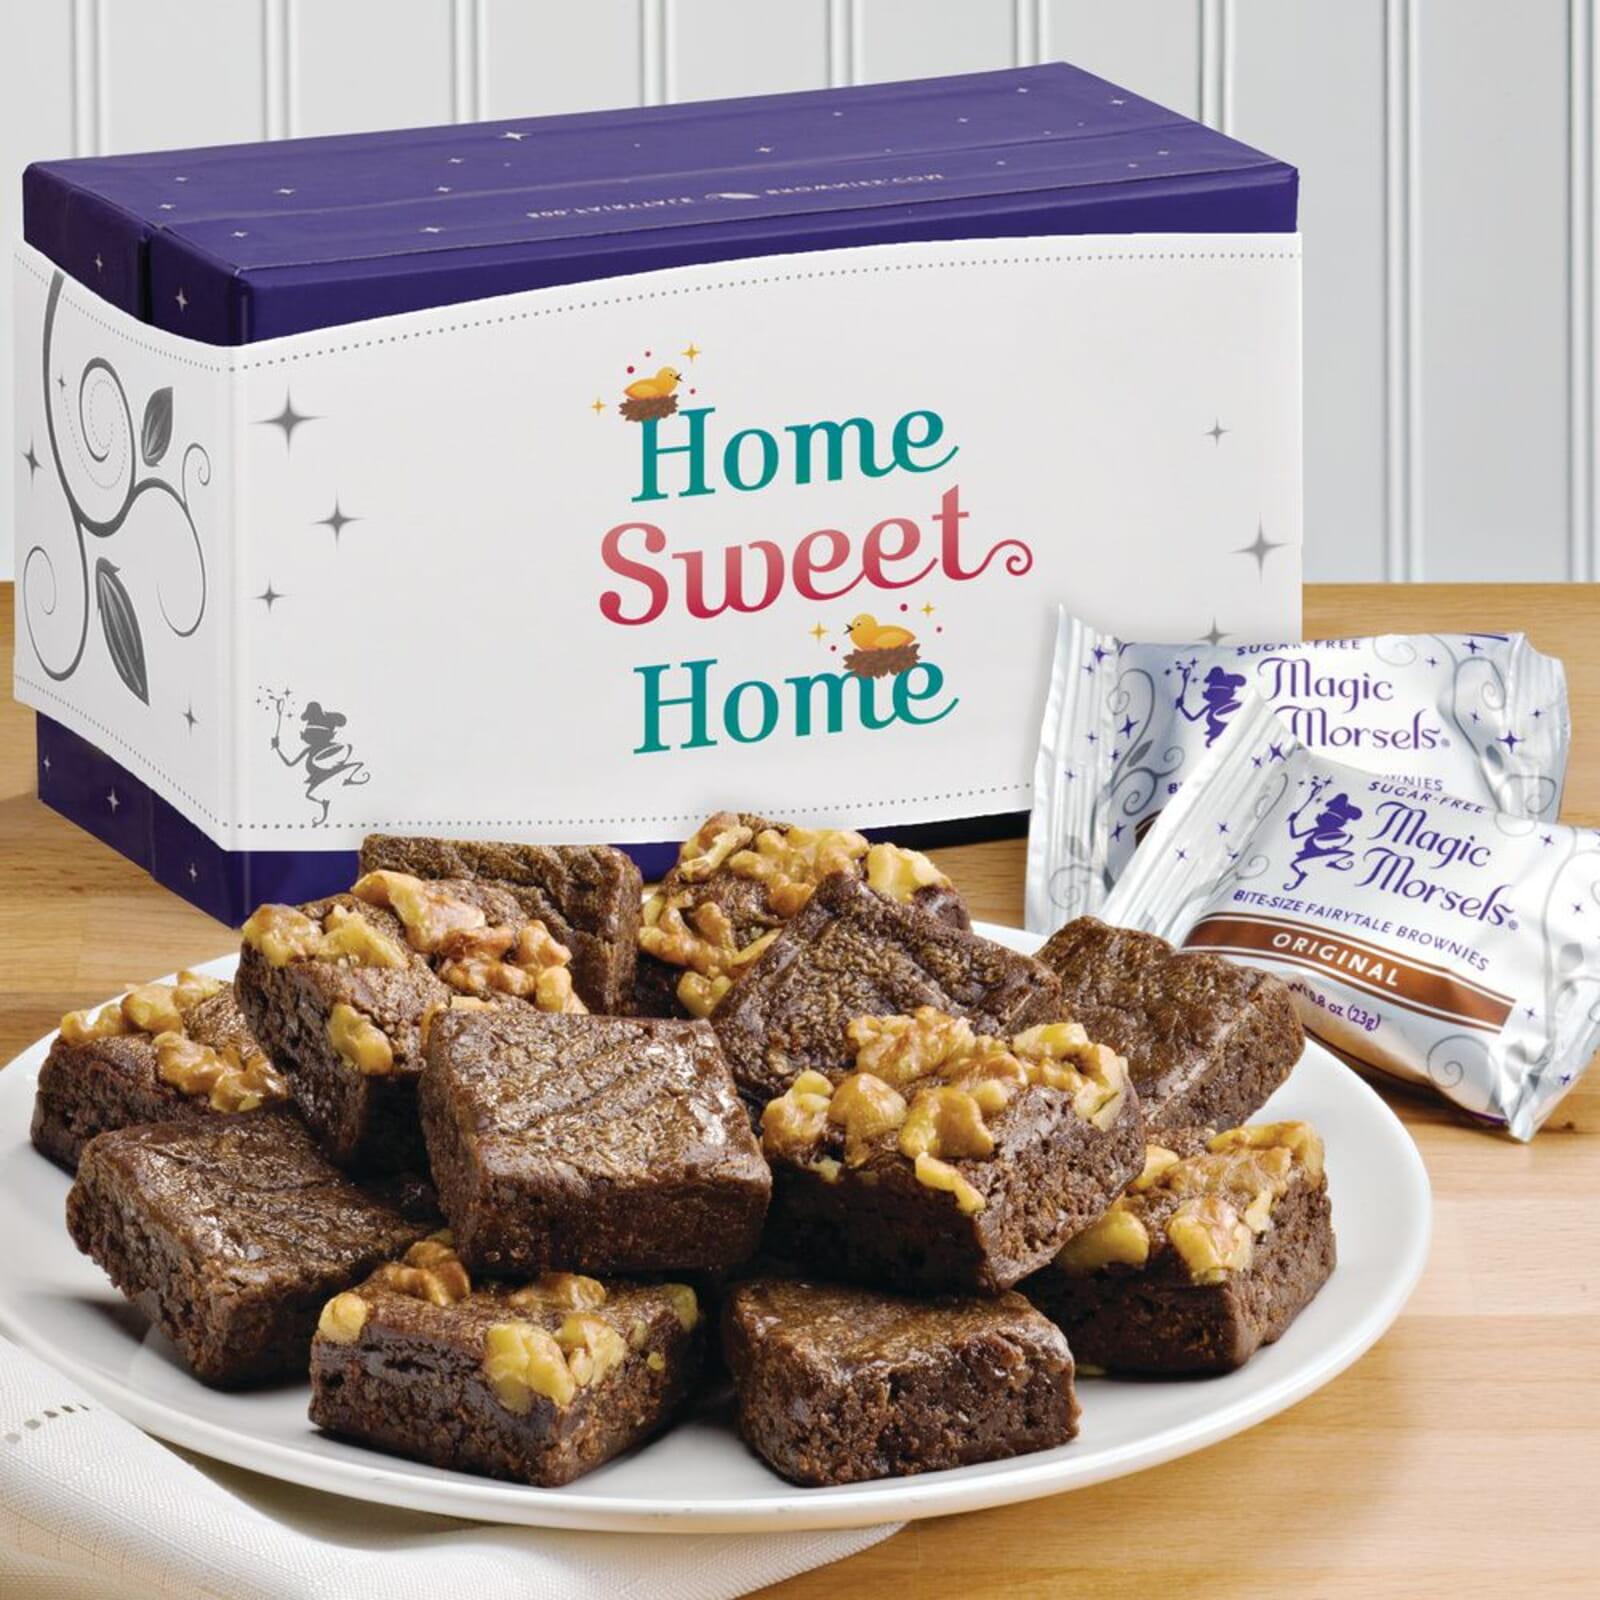 Home Sweet Home Sugar-Free Morsel Dozen